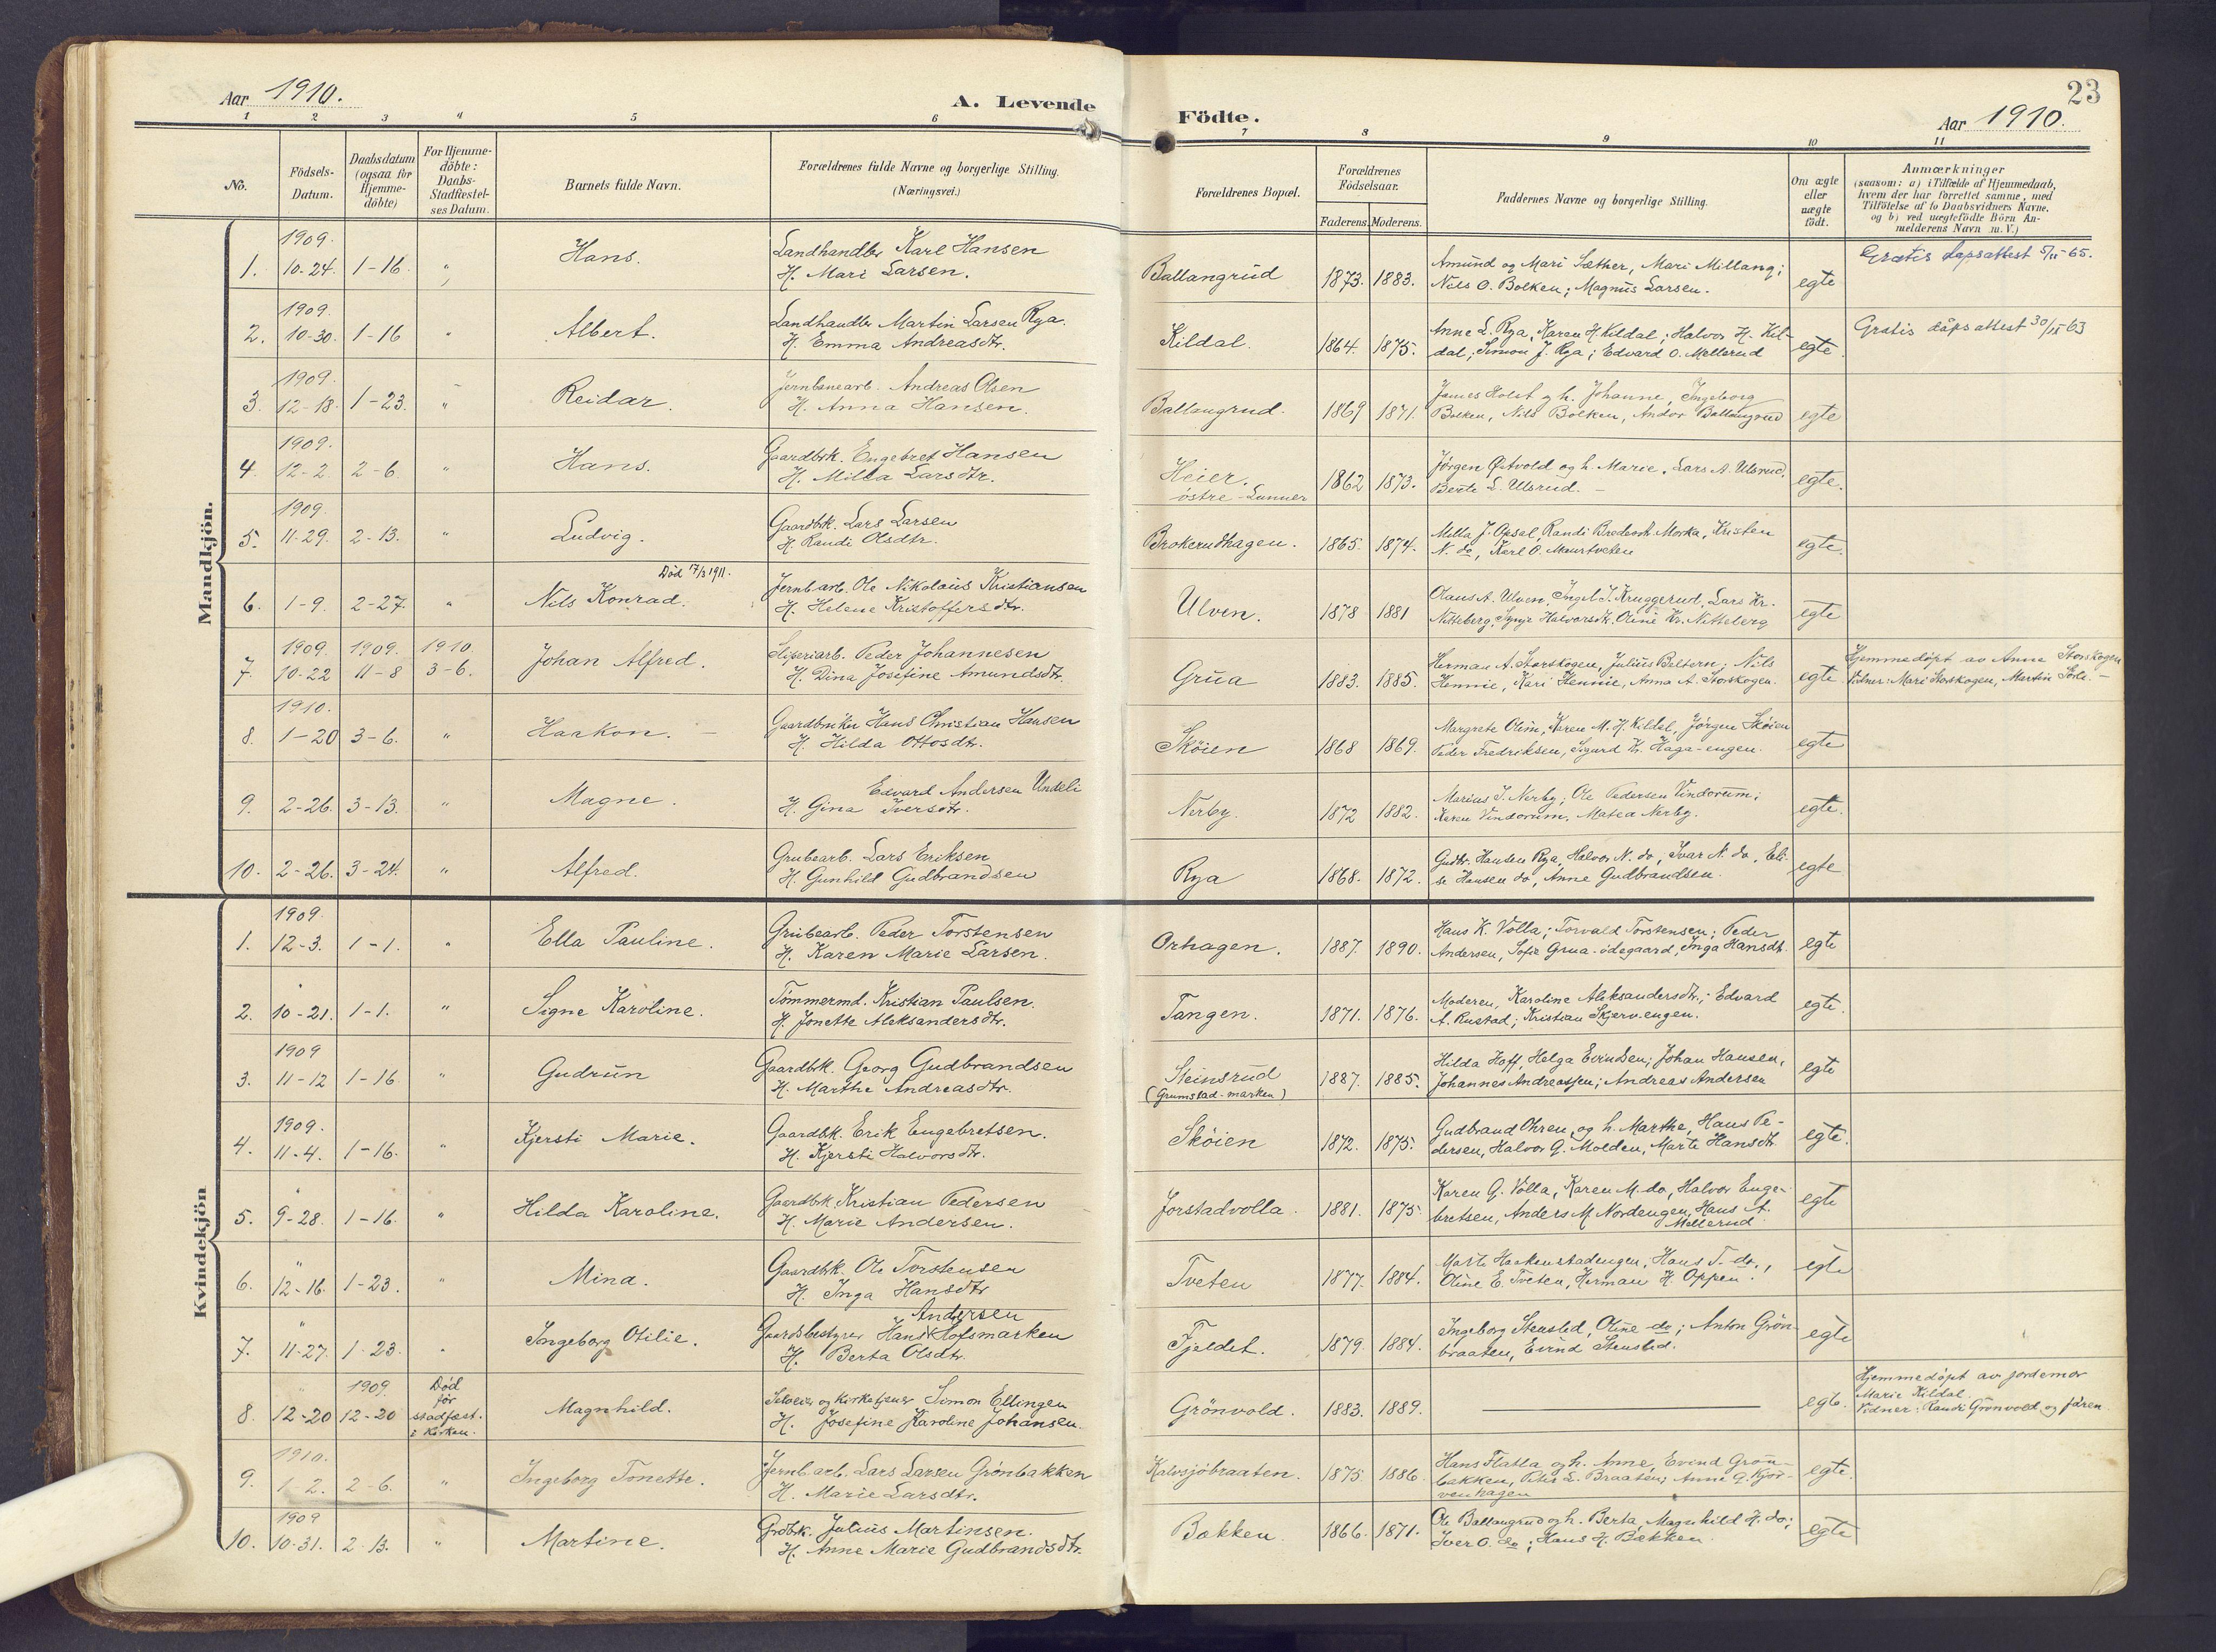 SAH, Lunner prestekontor, H/Ha/Haa/L0001: Ministerialbok nr. 1, 1907-1922, s. 23